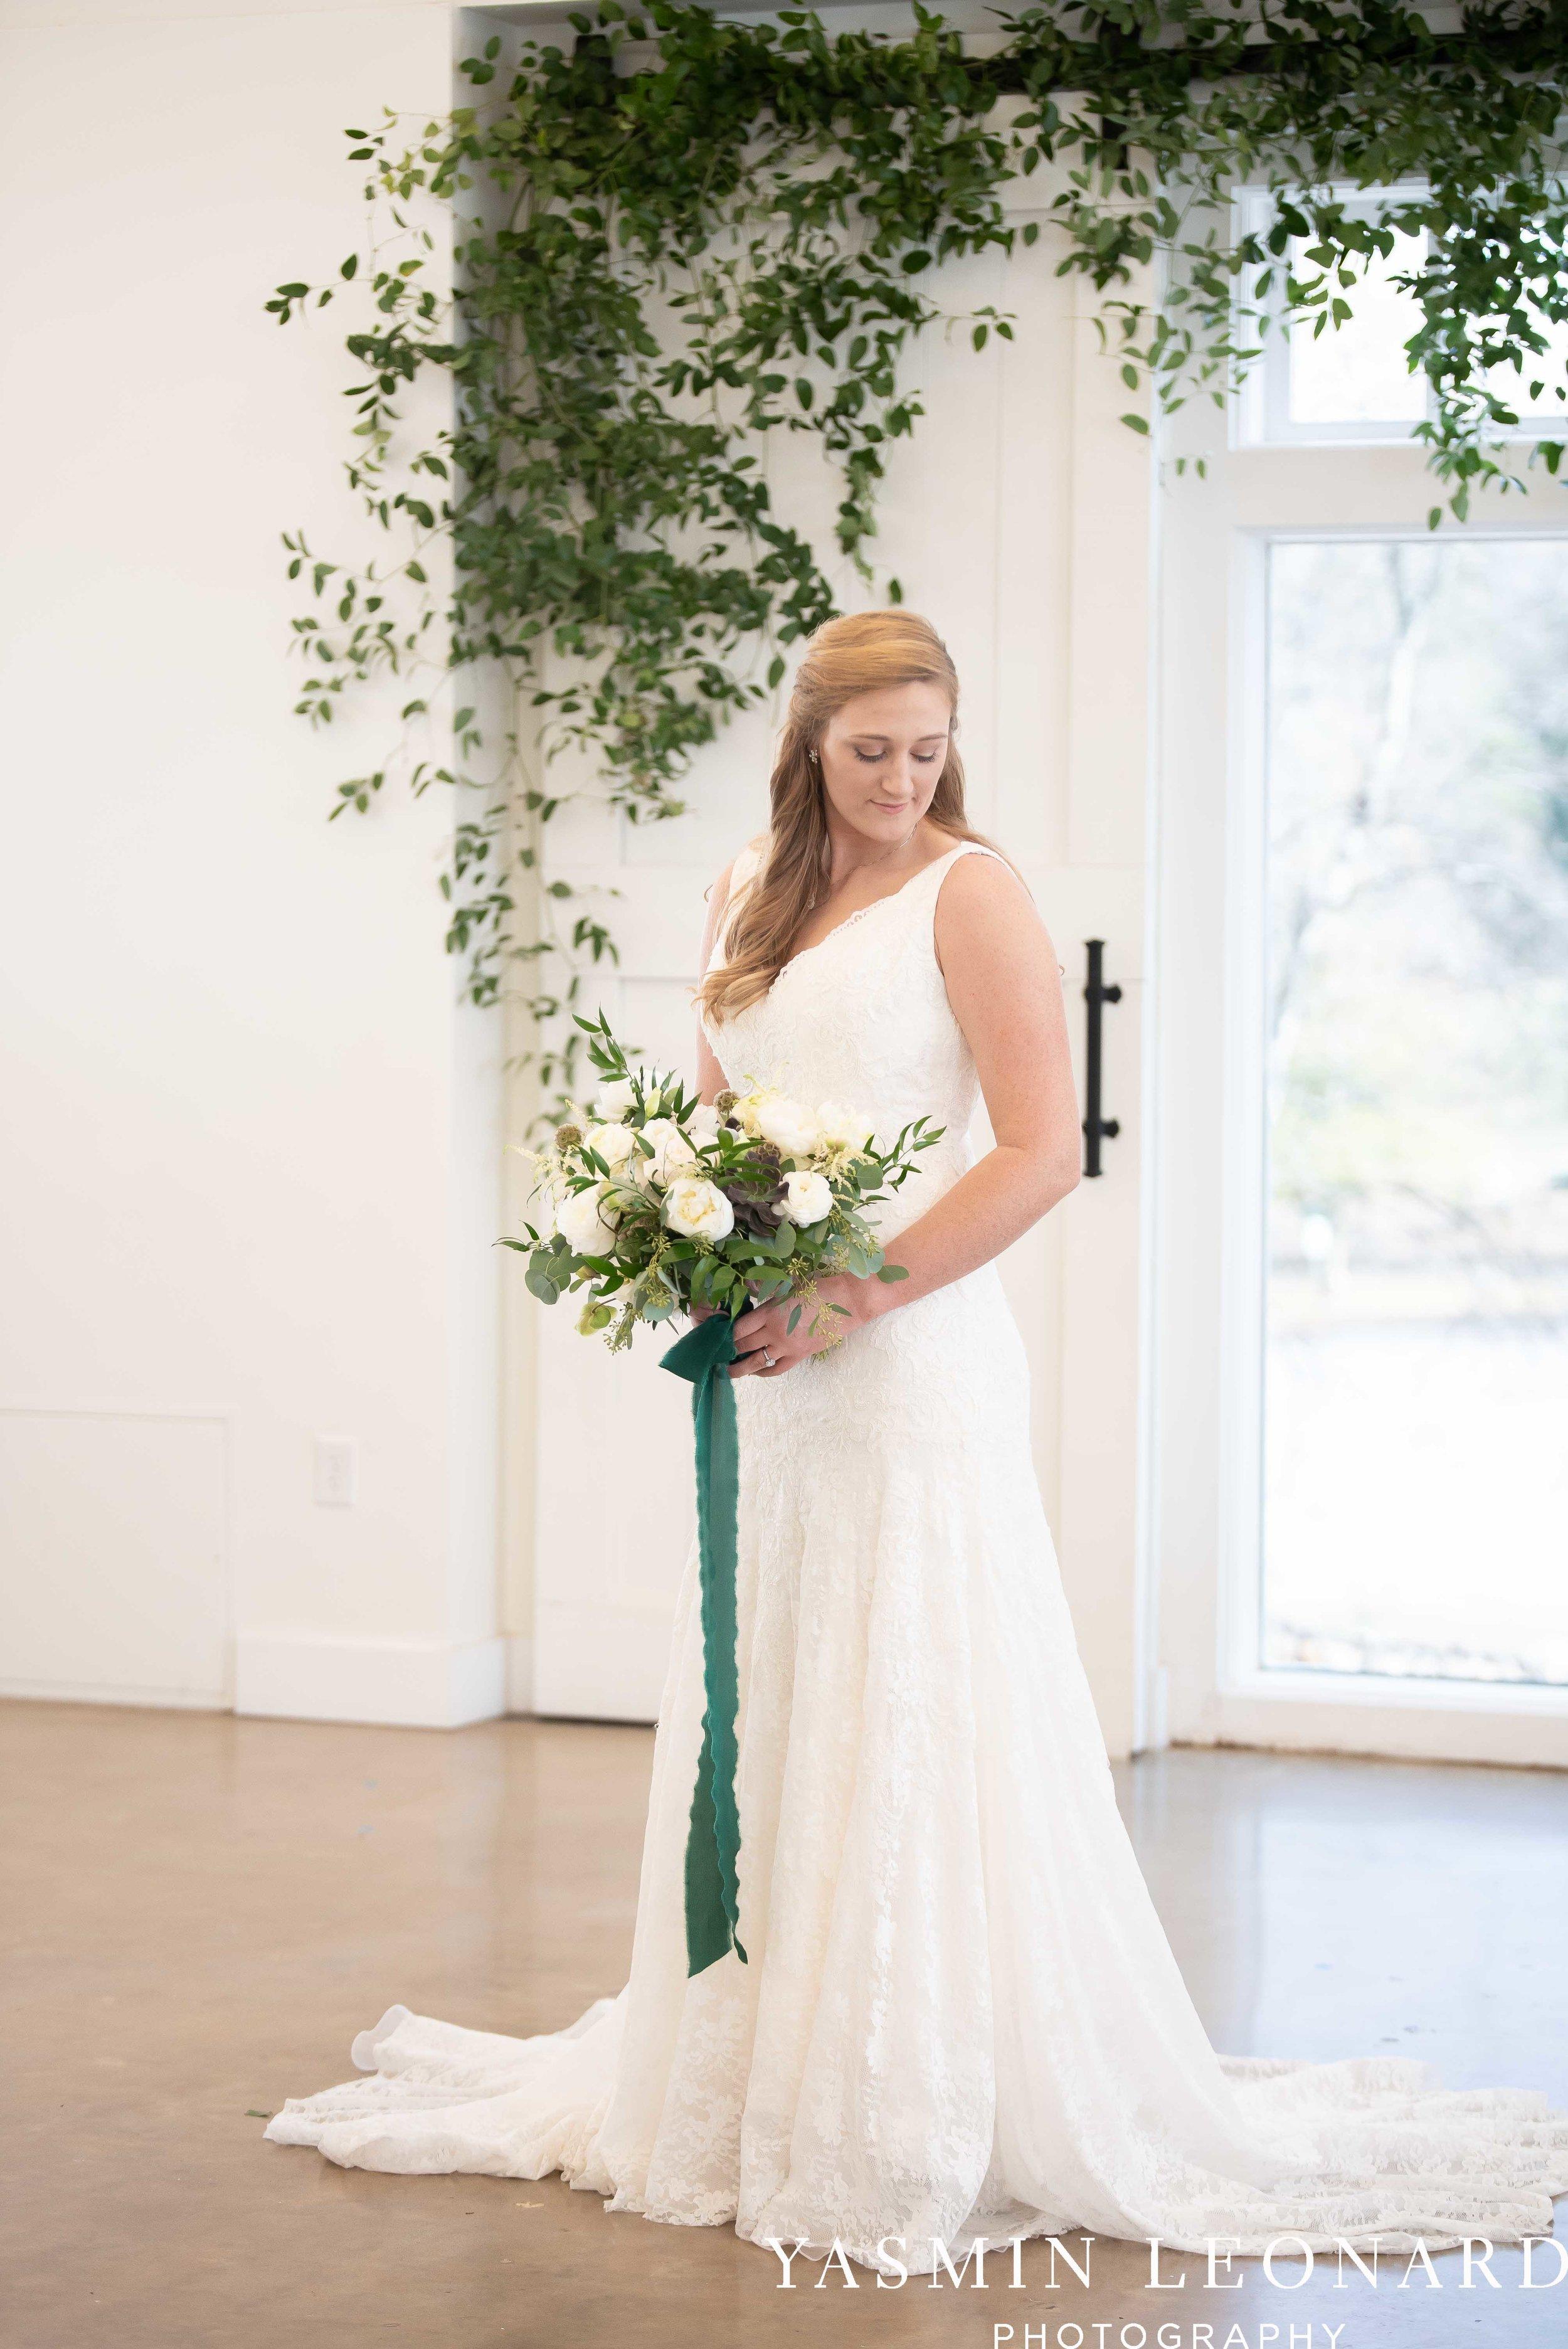 Barn at Reynolda Village - Winston Salem Wedding - White and Green Wedding - NC Wedding - NC Barns - Yasmin Leonard Photography-15.jpg